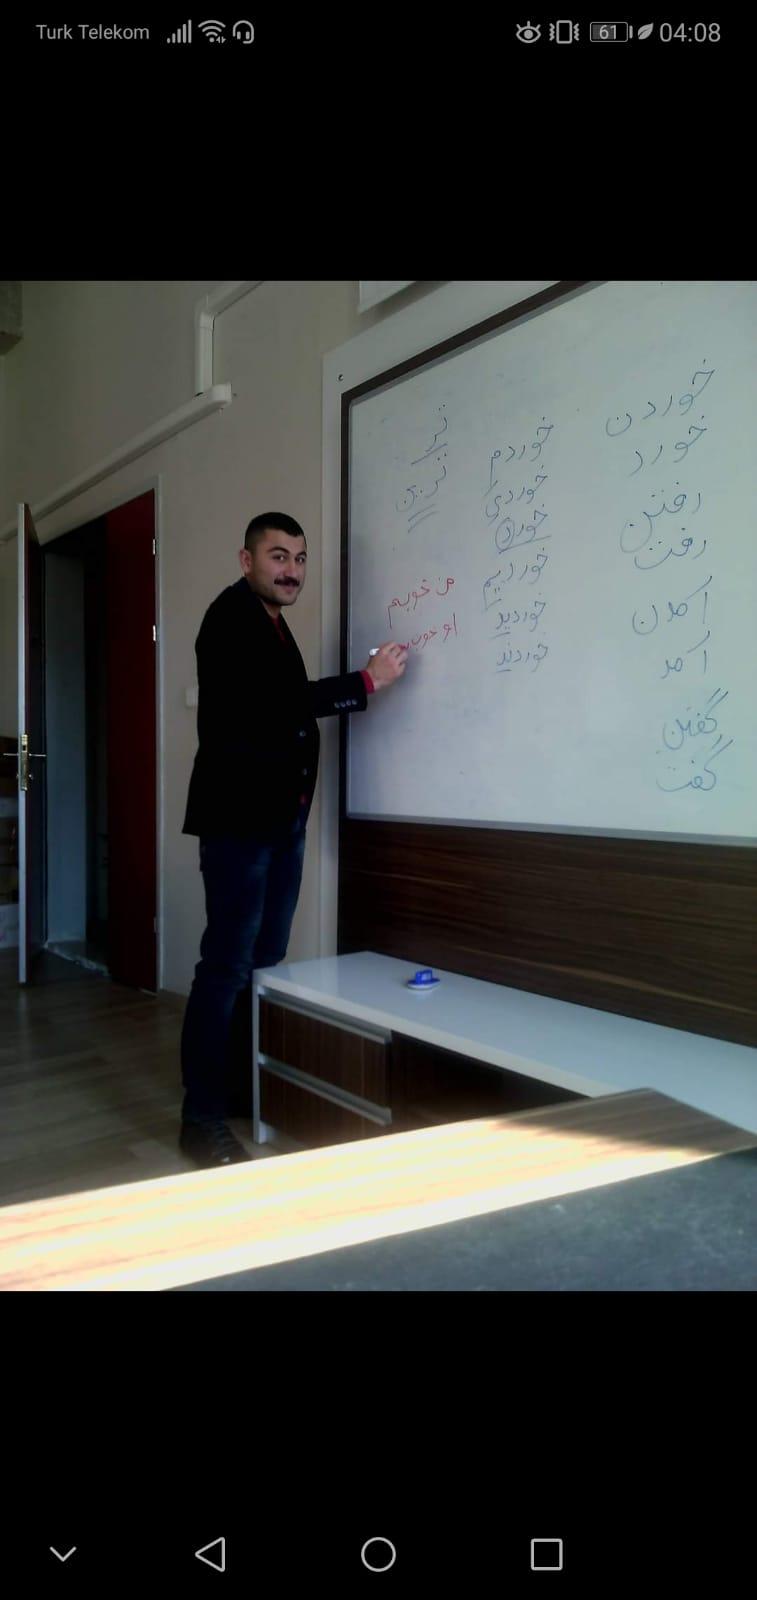 nurullah82